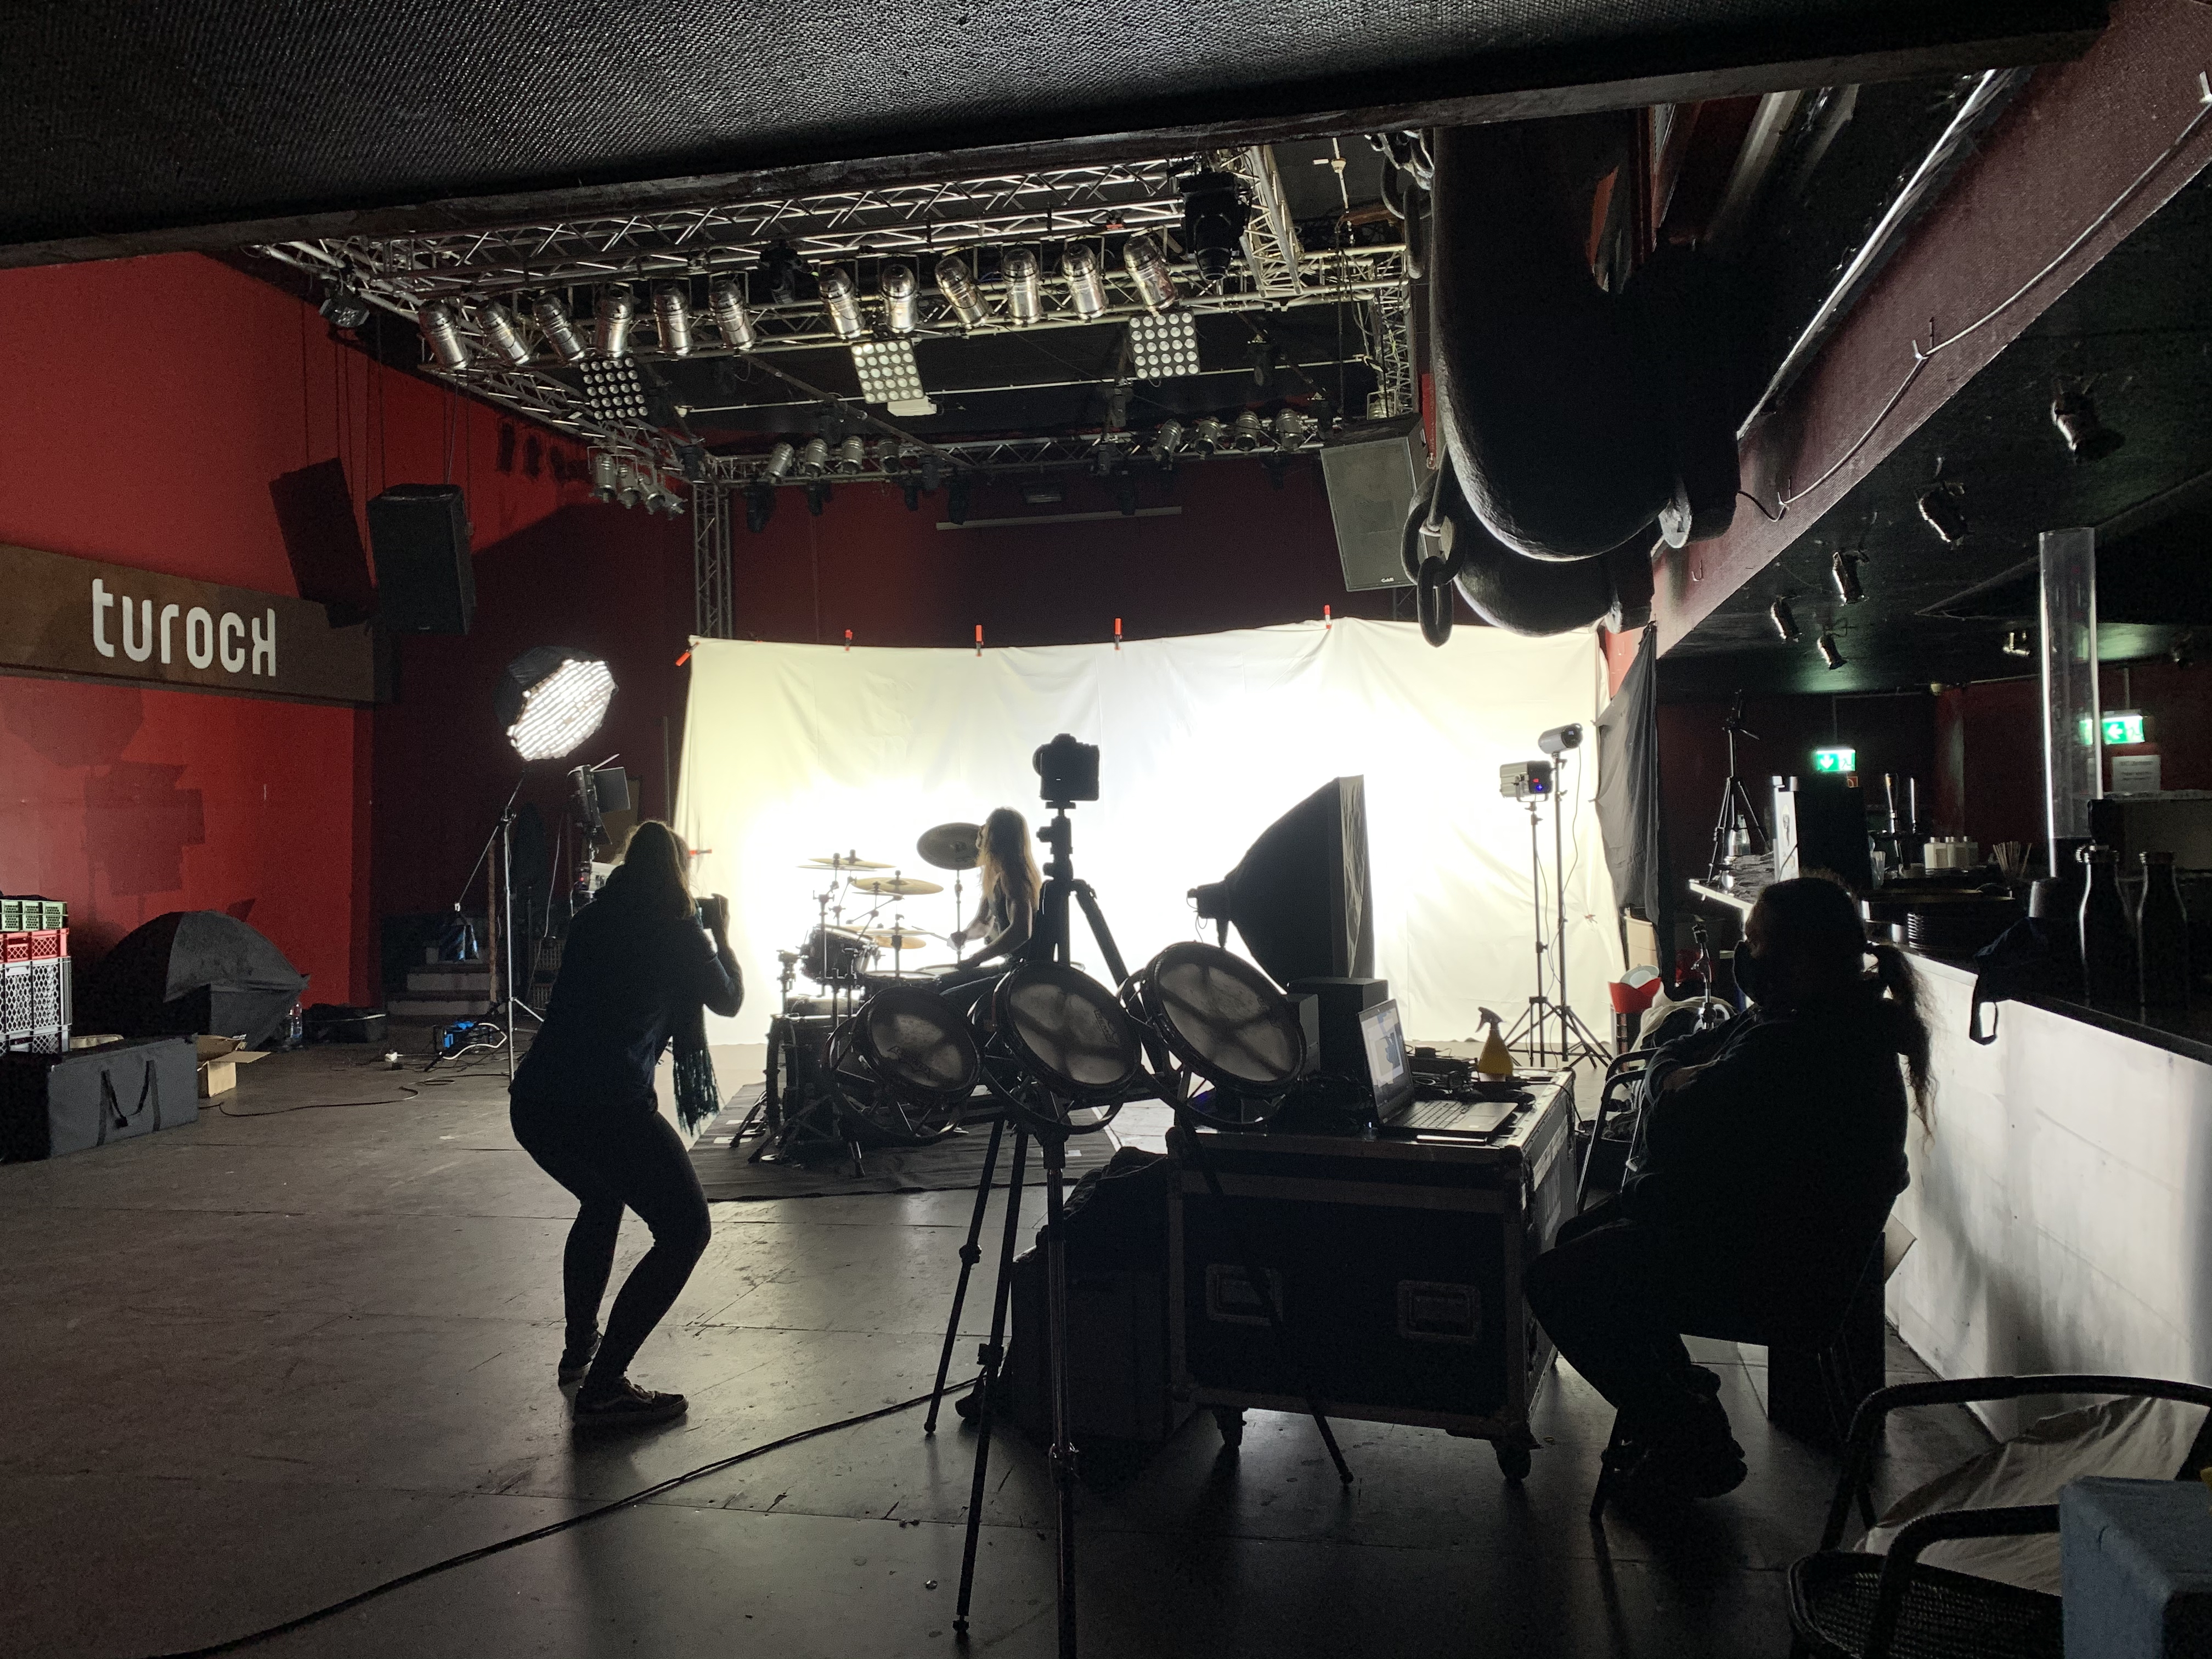 The-Very-End-Metal-Video-Shoot-behind-the-scenes_5347